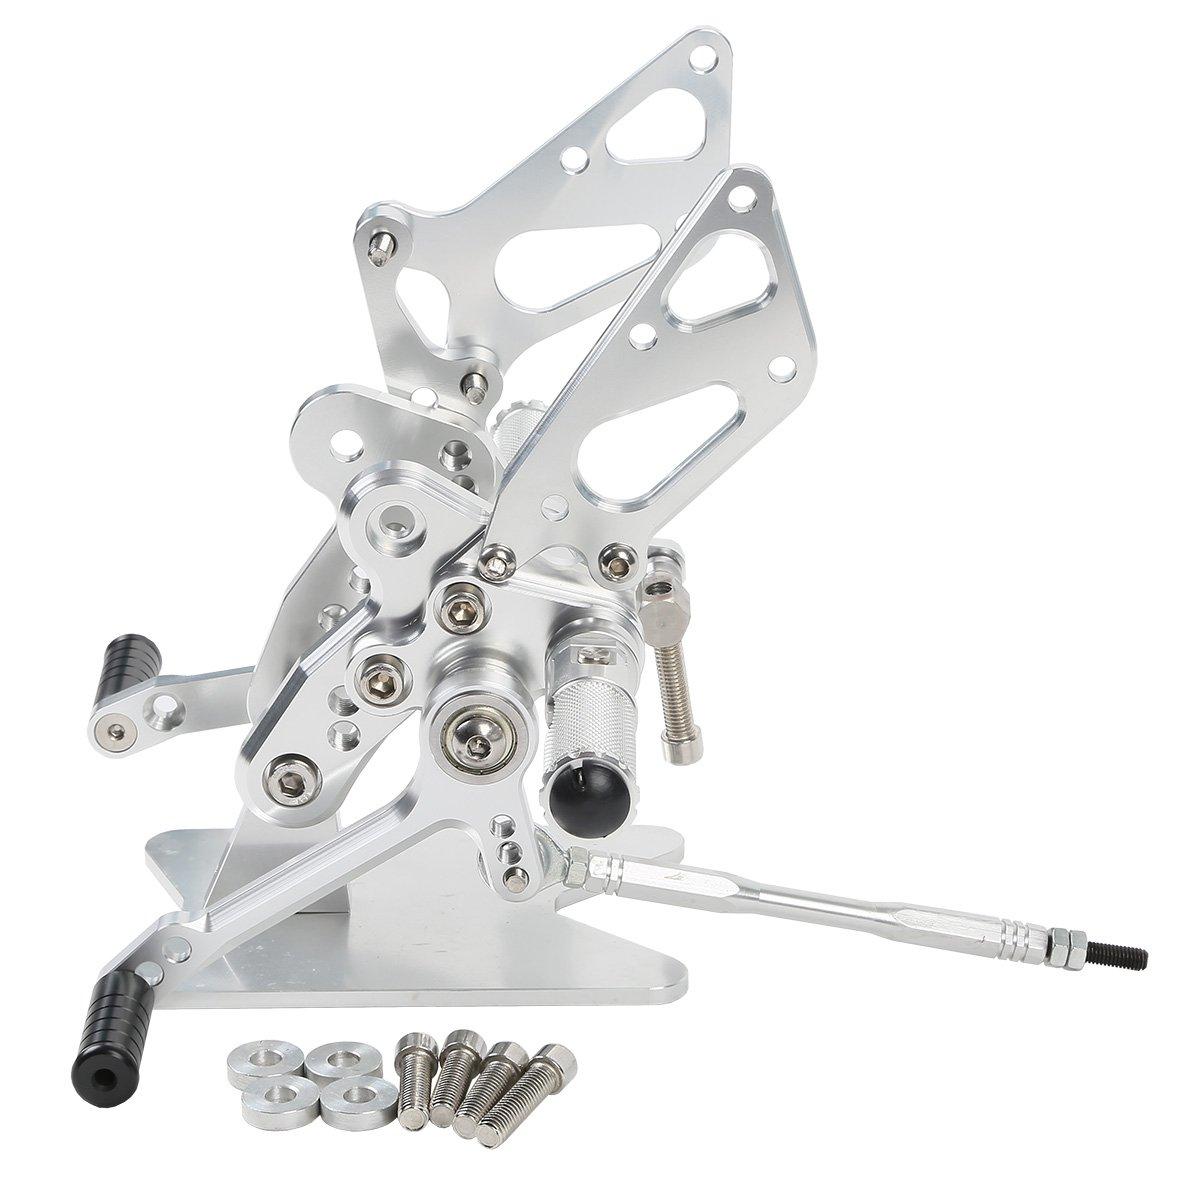 TengChang motocicleta Plata CNC Ajustable trasera estribera Reposapi/és Para Suzuki Hayabusa GSXR1300 GSX1300R GSXR 1300 1999 2000 2001 2002 2003 2004 2005 2006 2007 2008 2009 2010 2011 2012 2013 2014